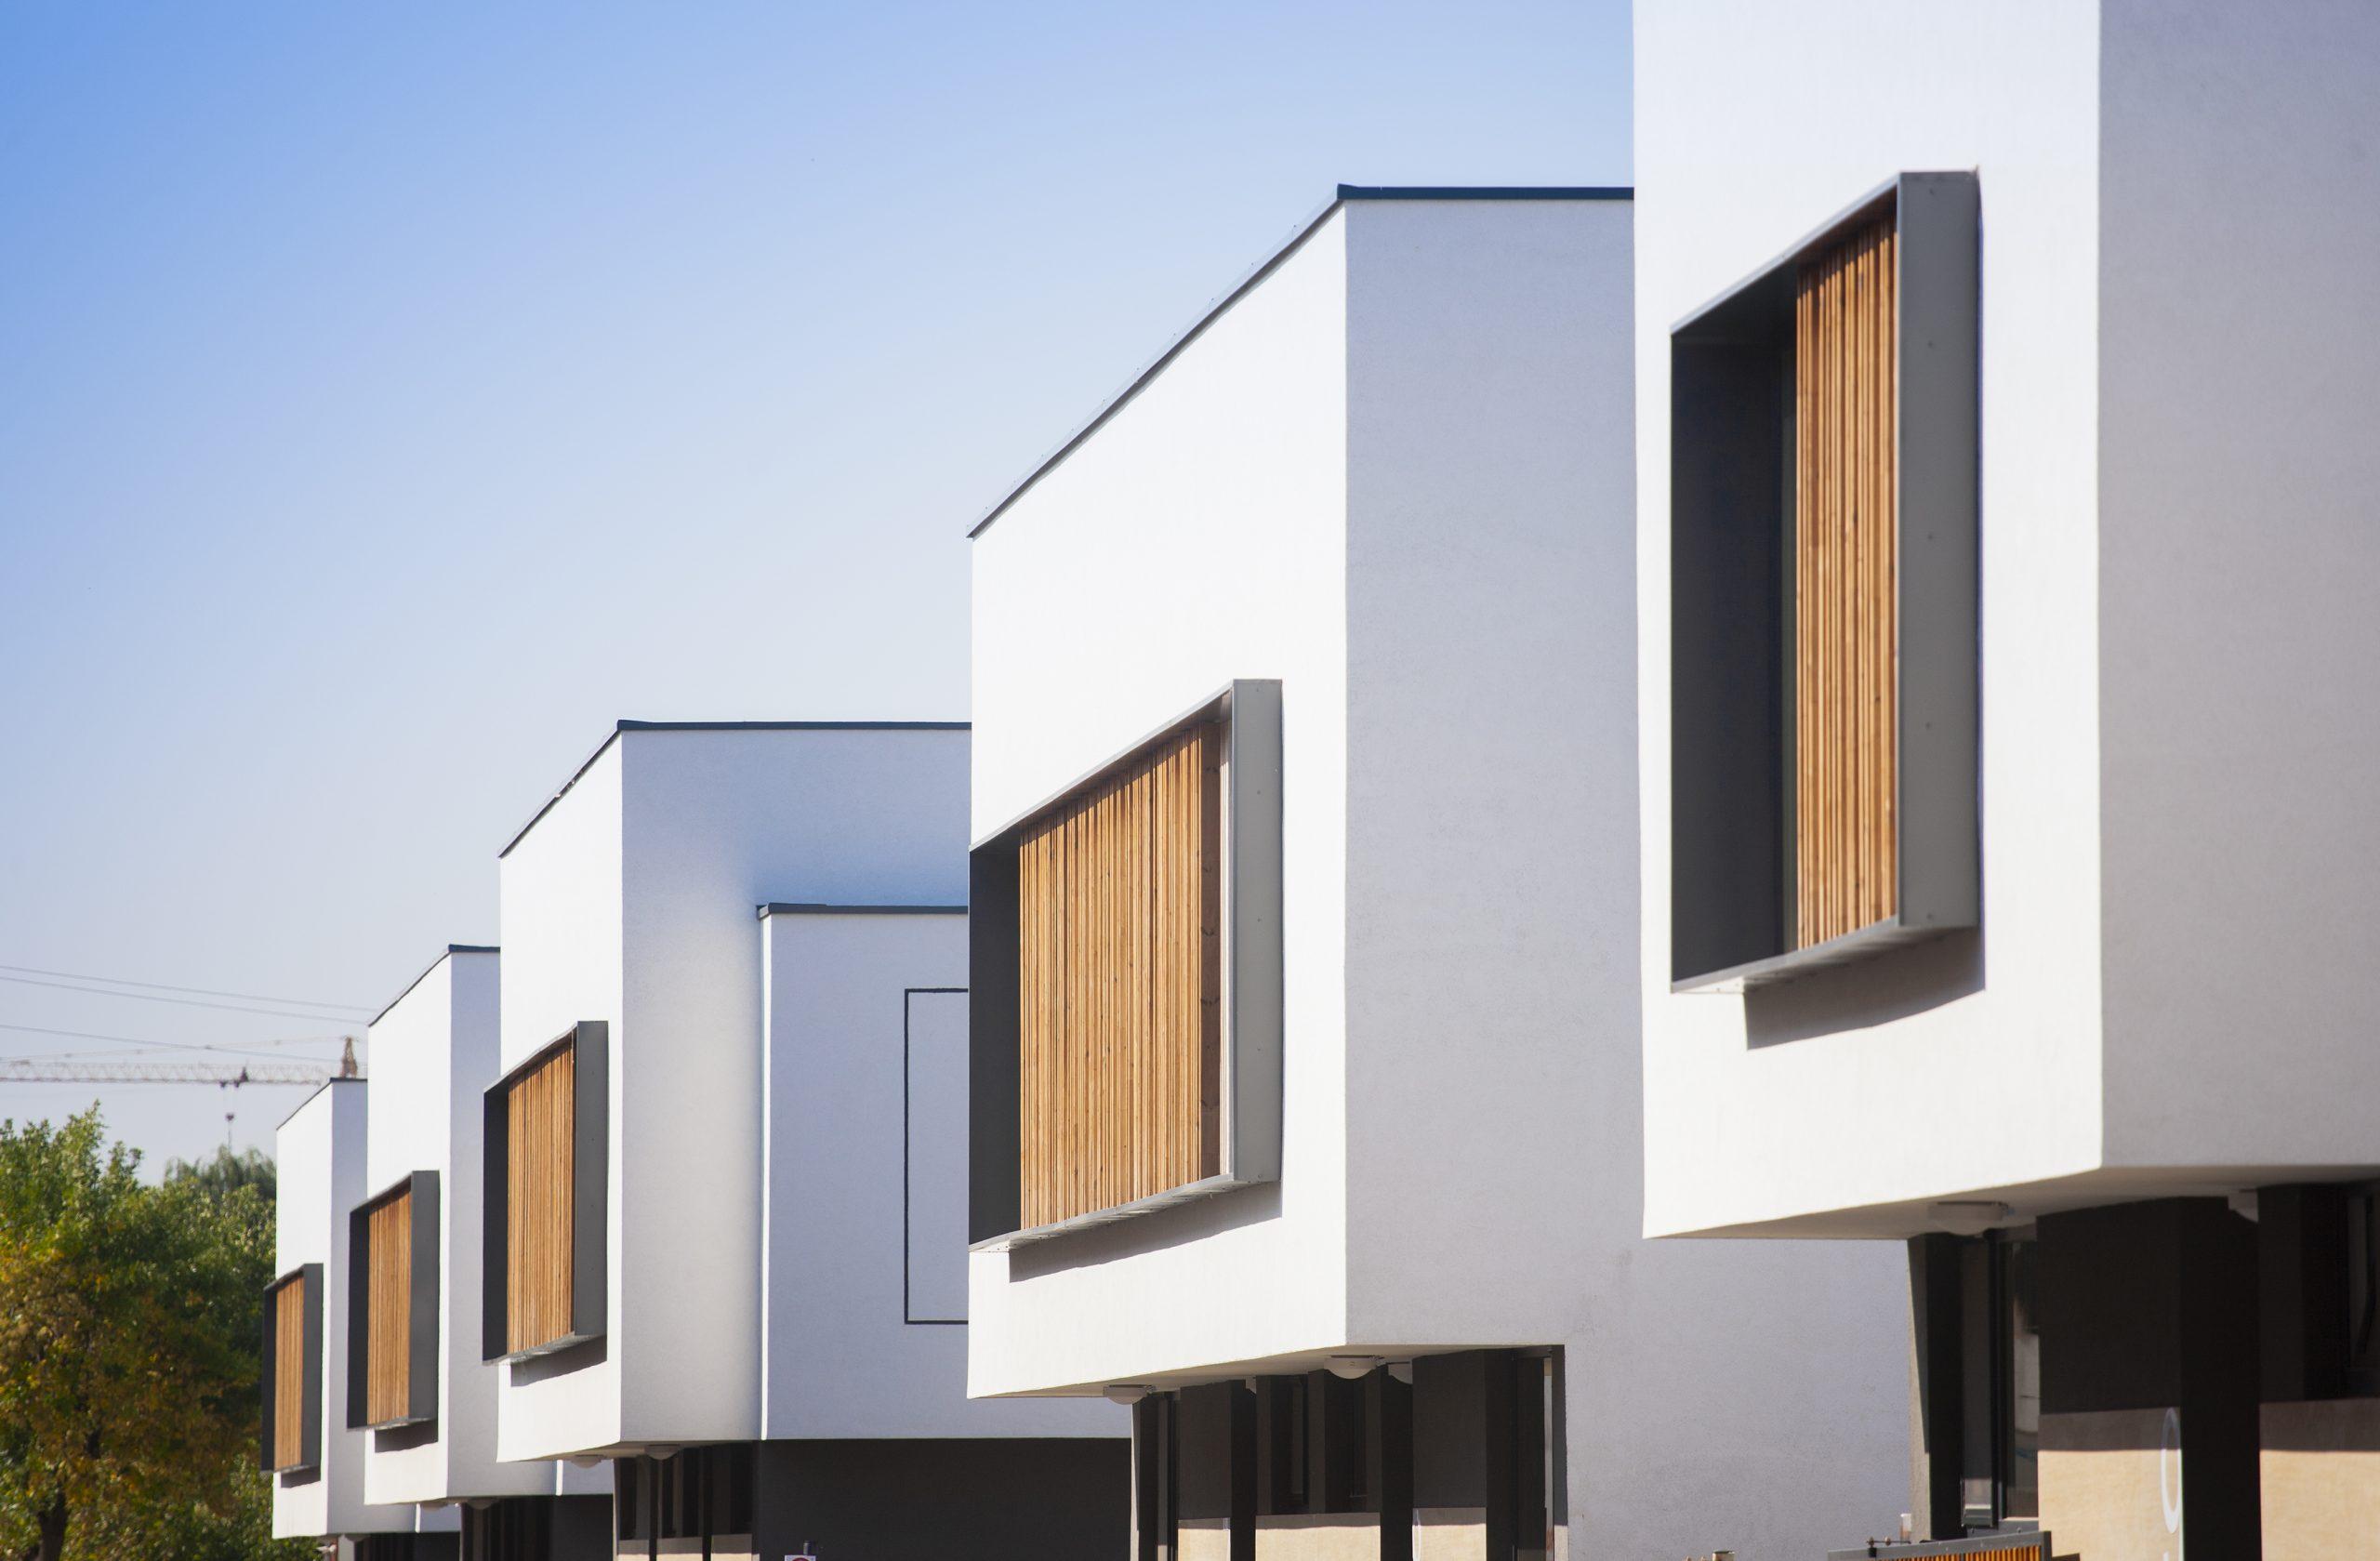 https://nbc-arhitect.ro/wp-content/uploads/2020/10/NBC-Arhitect-_-residentials-_-Contemporan-Residence-_-Bucharest-Romania_9-1-scaled.jpg